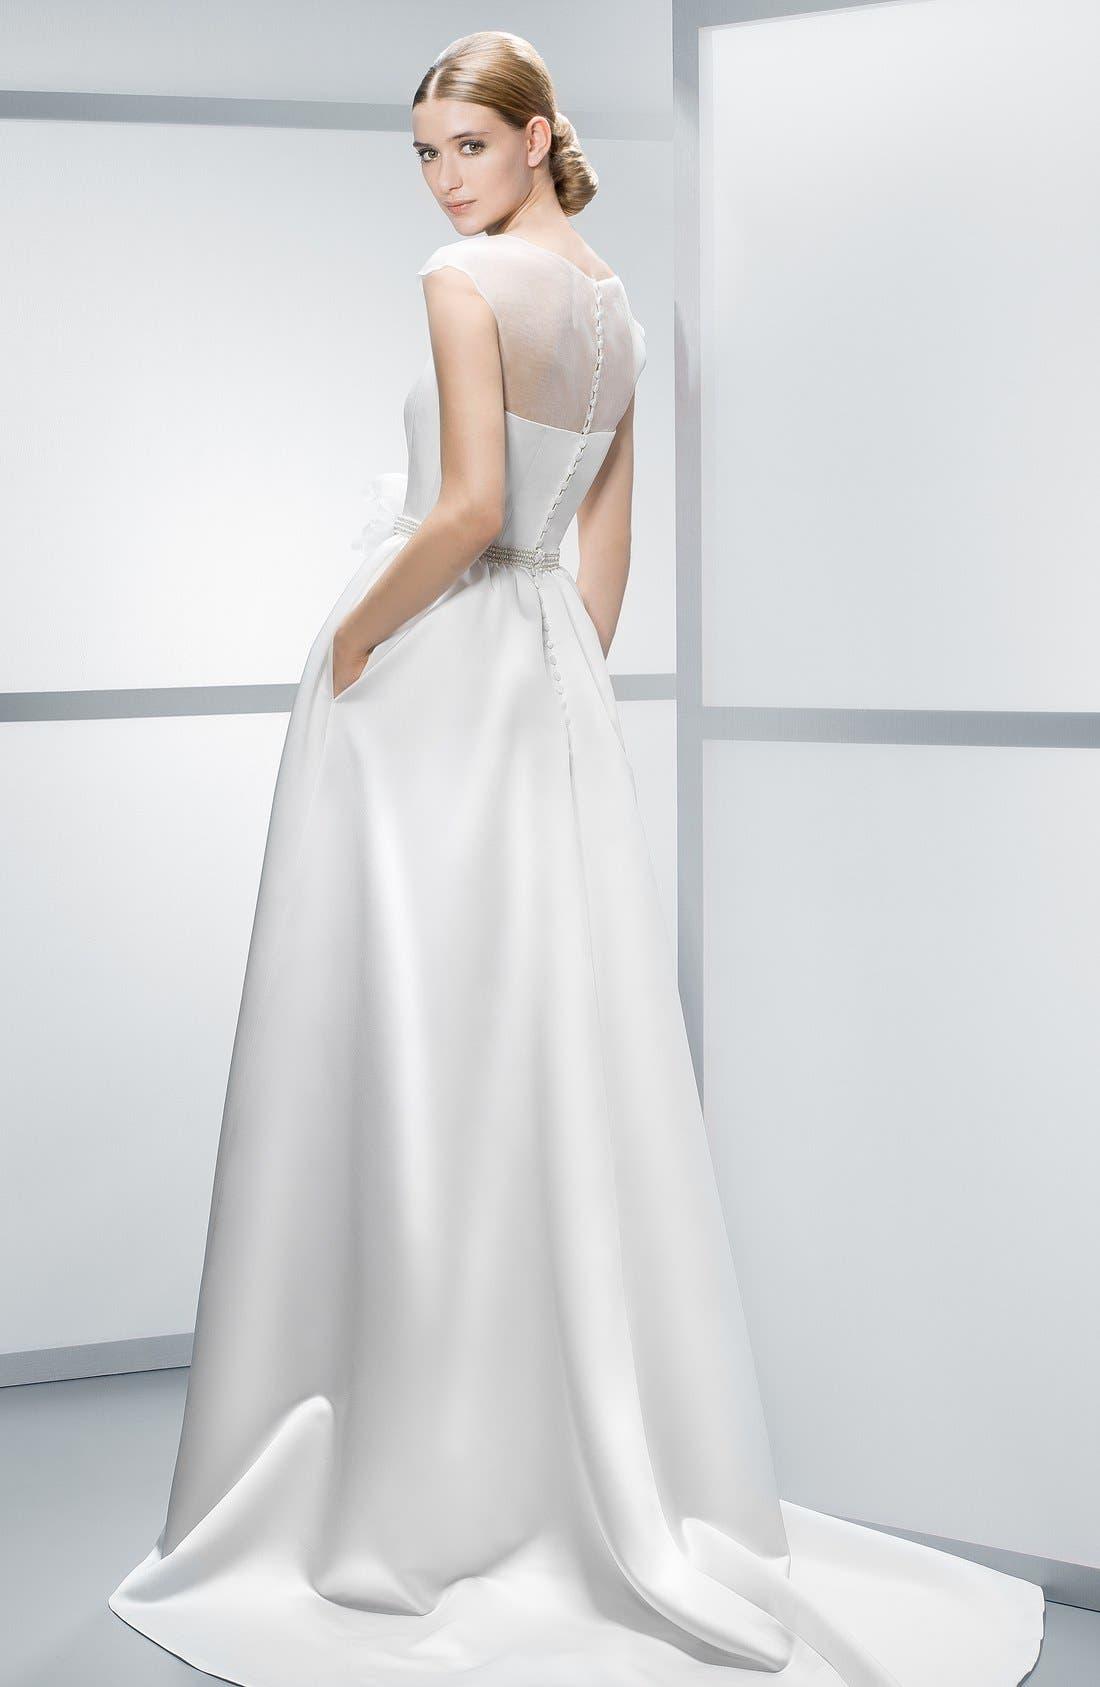 A-Line Wedding Dresses & Bridal Gowns   Nordstrom